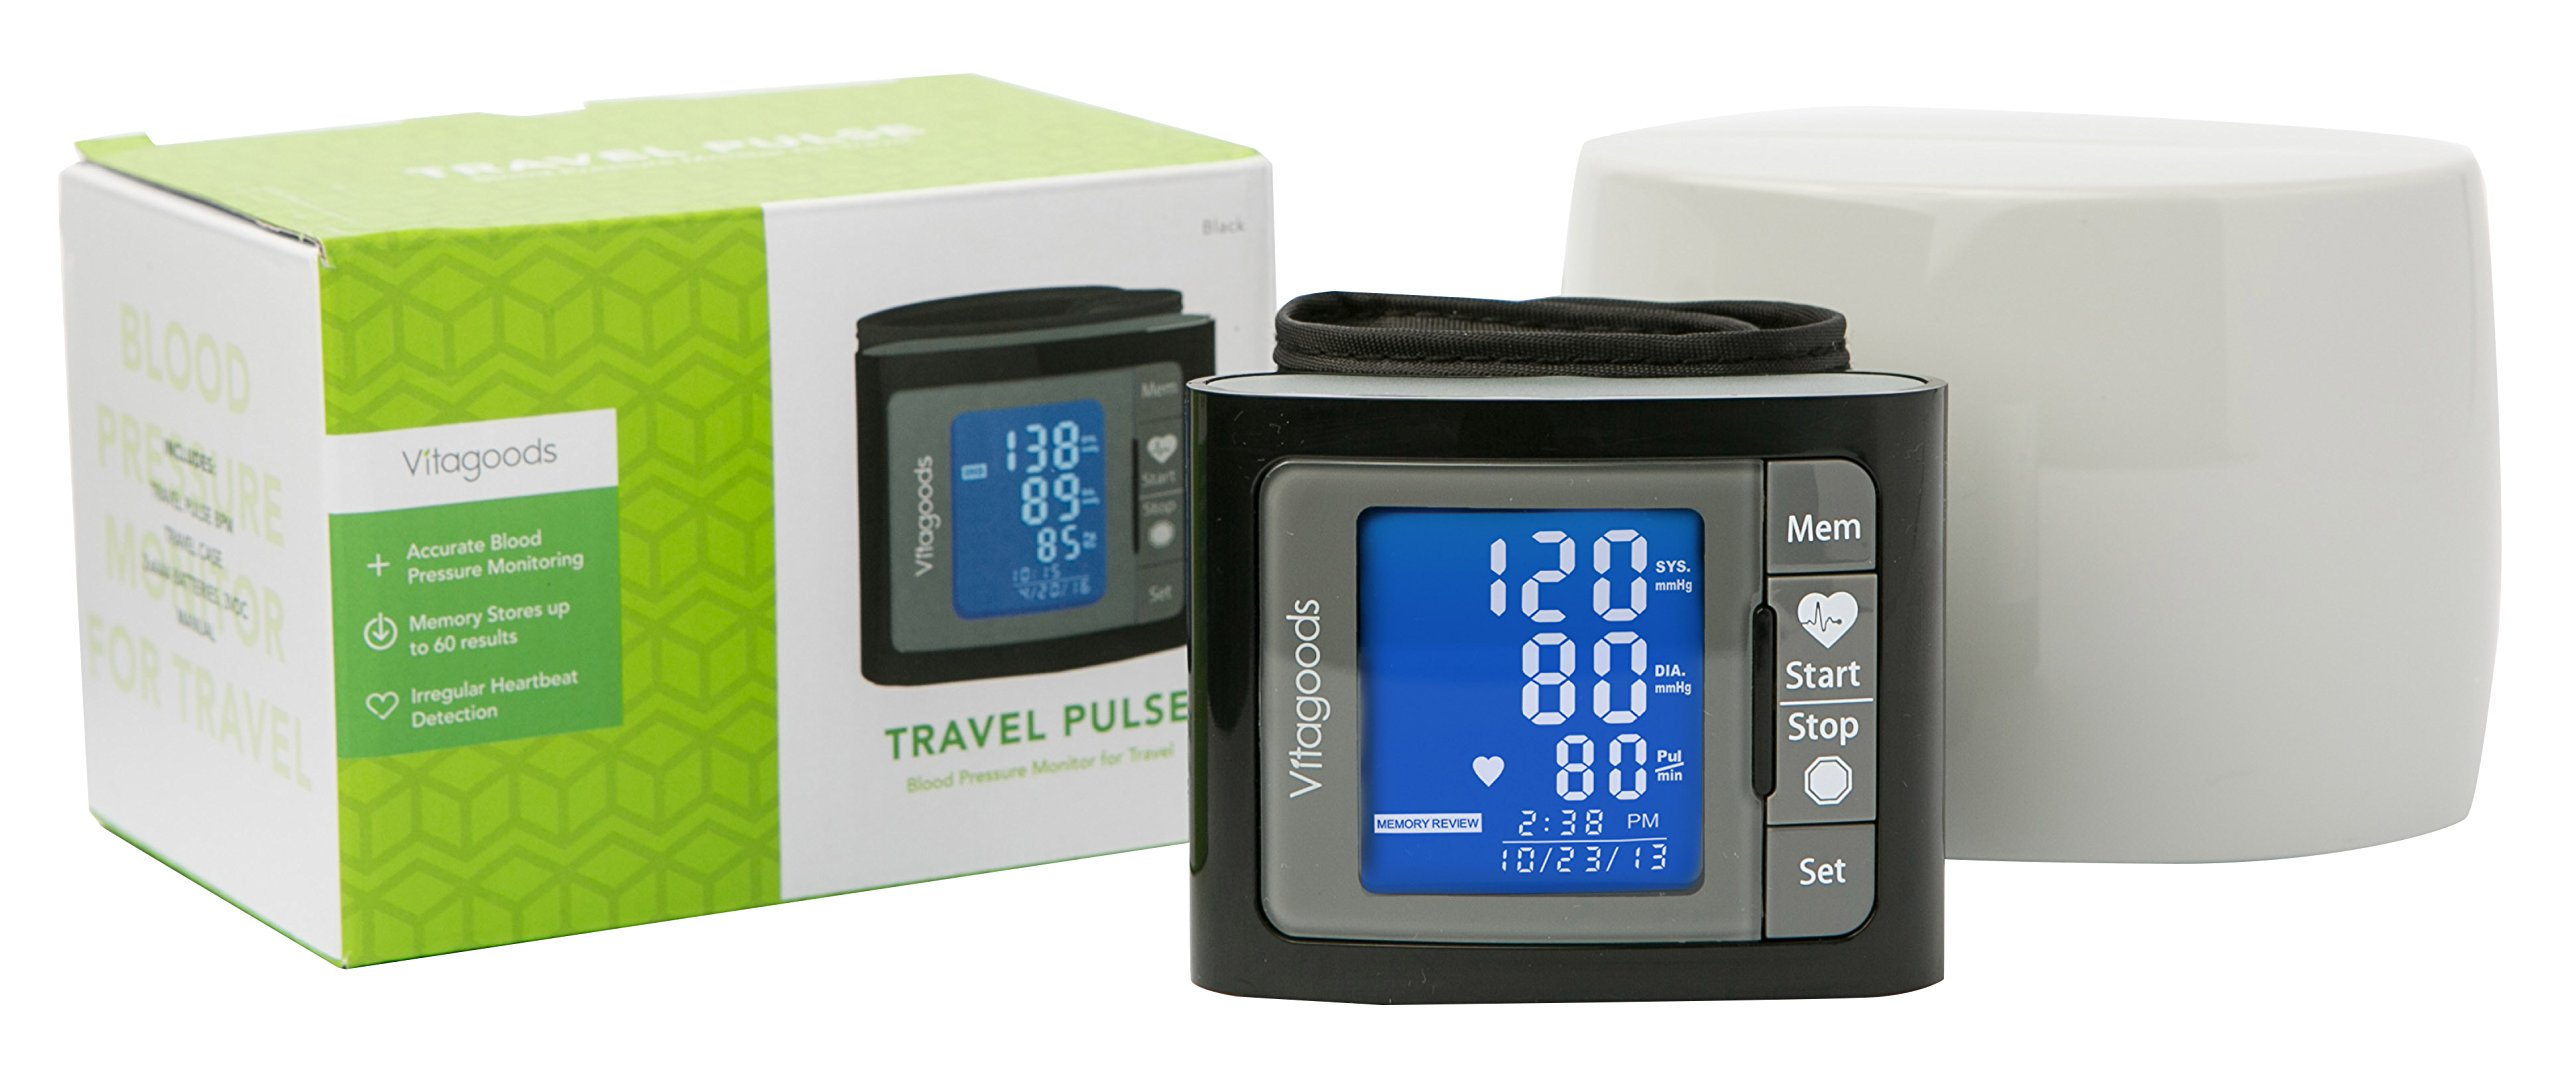 Vitagoods Travel Blood Pressure Monitor, Black